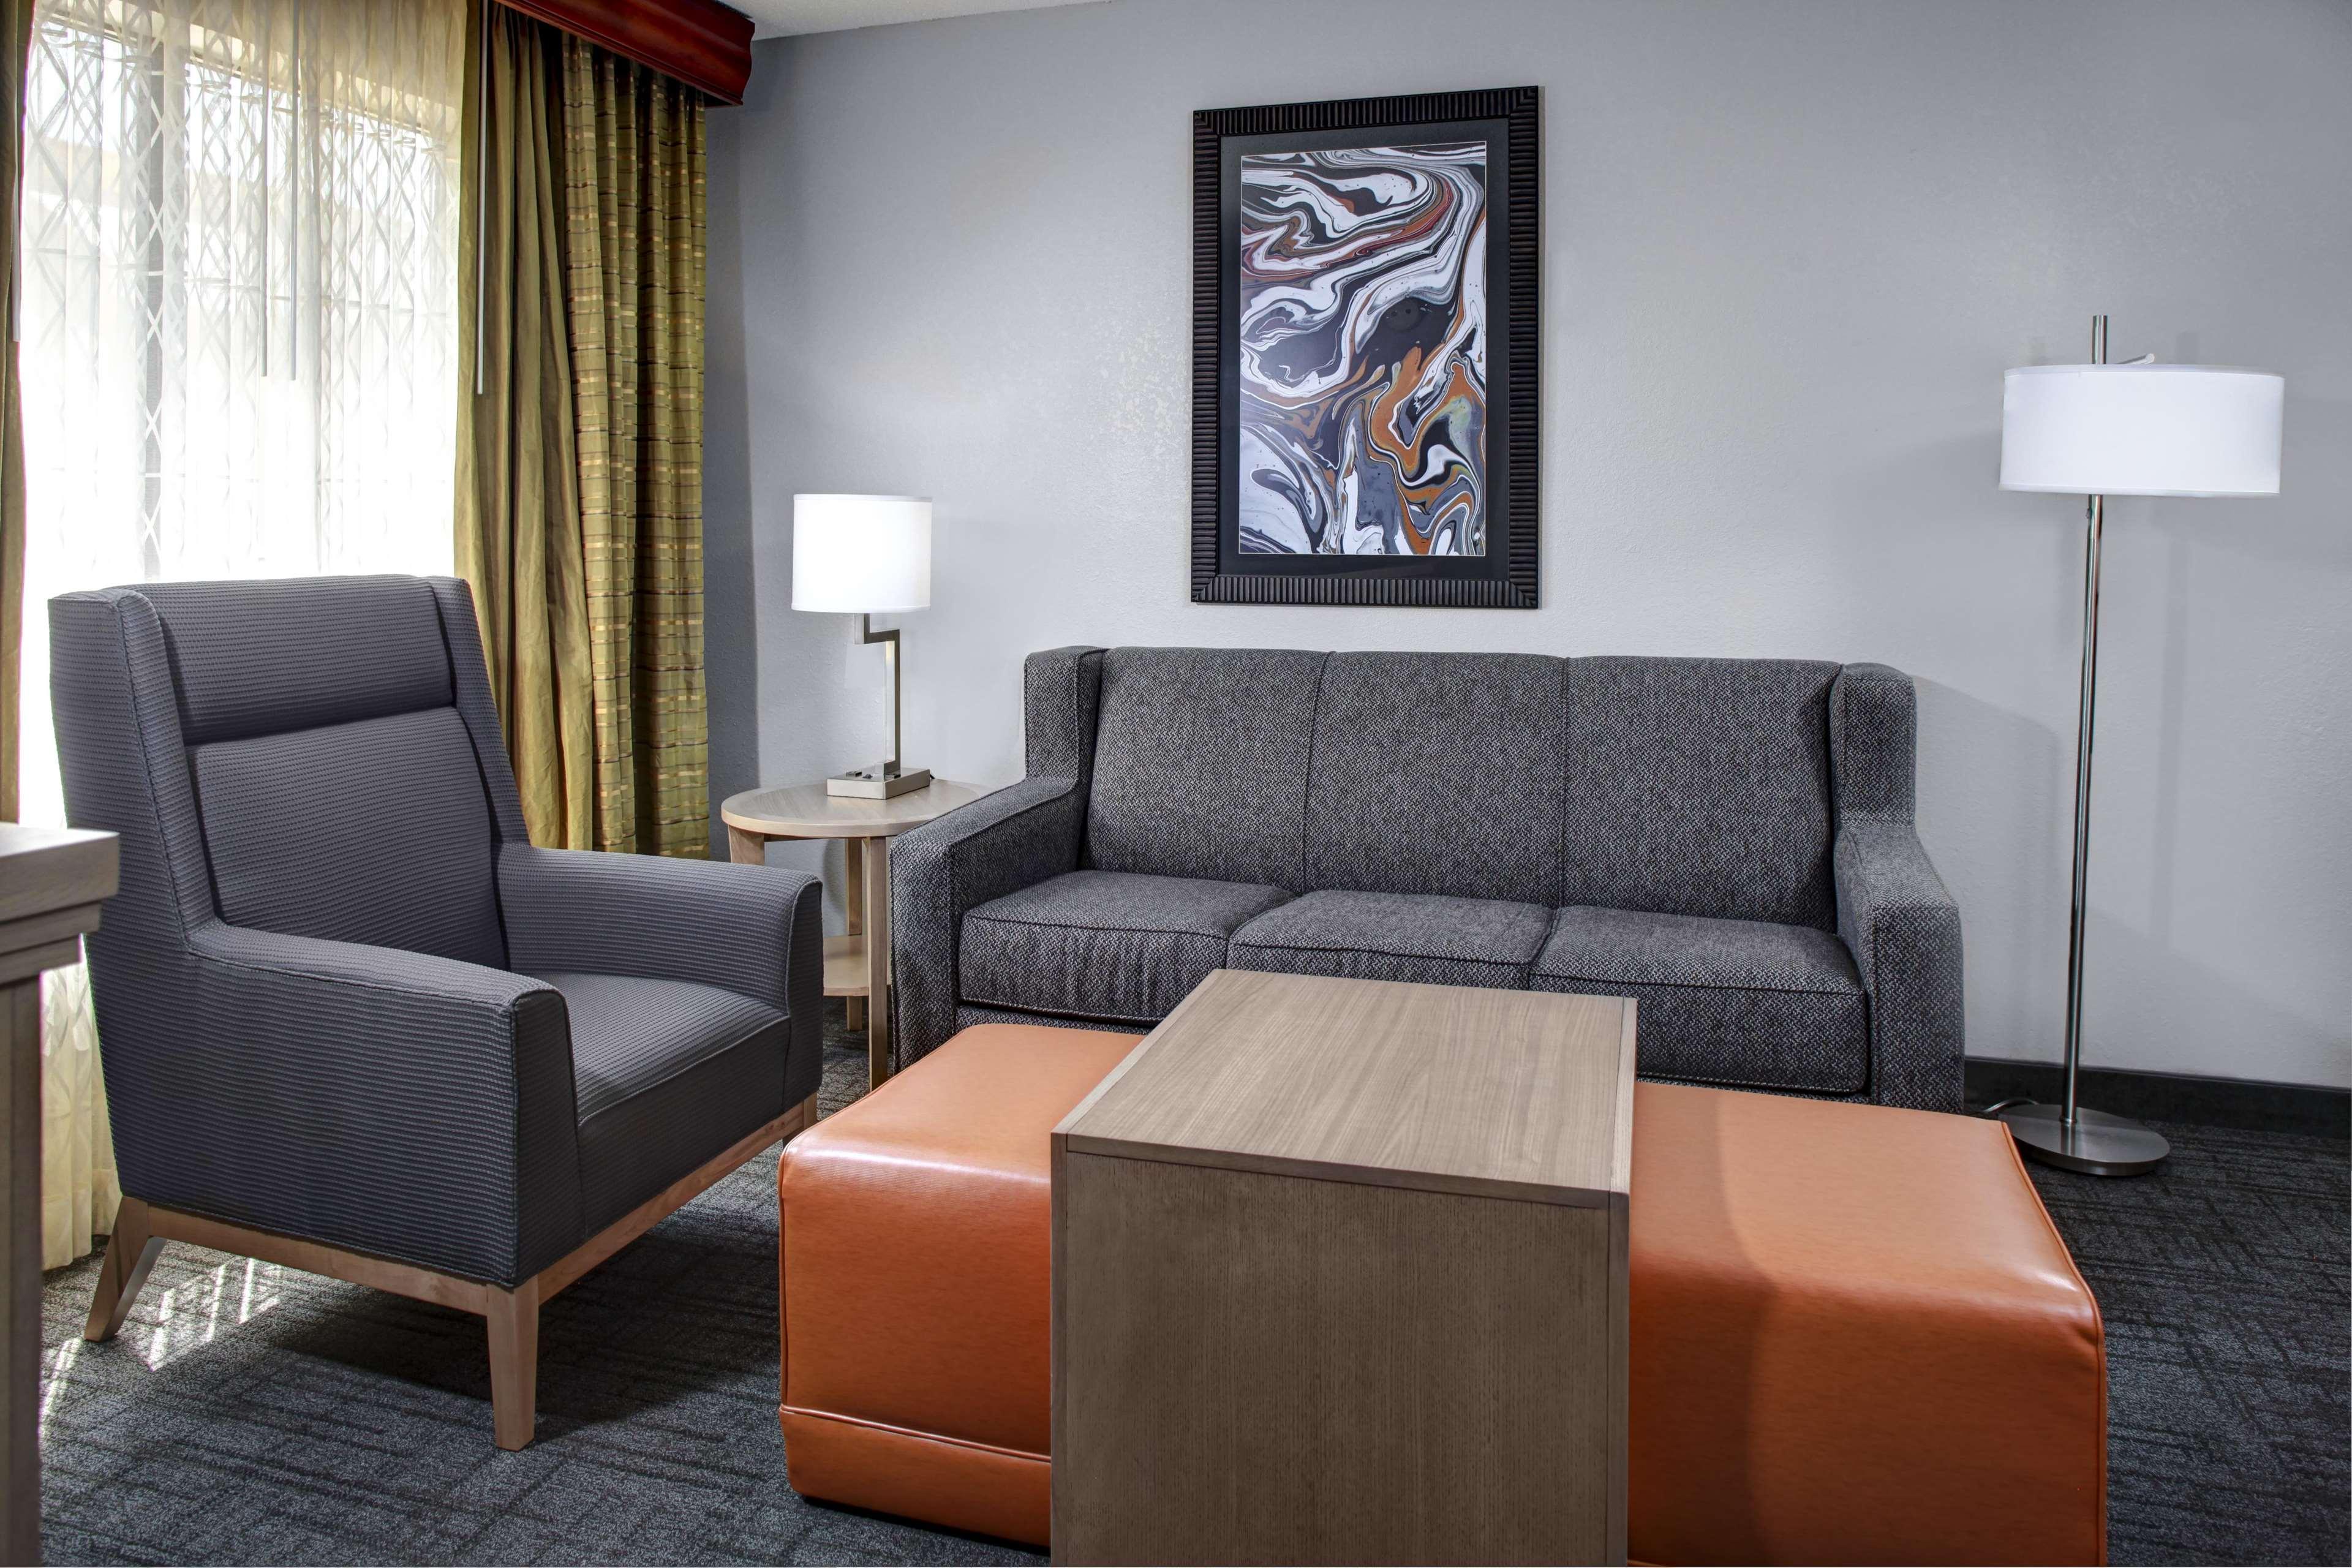 Homewood Suites by Hilton Richmond-West End/Innsbrook image 14